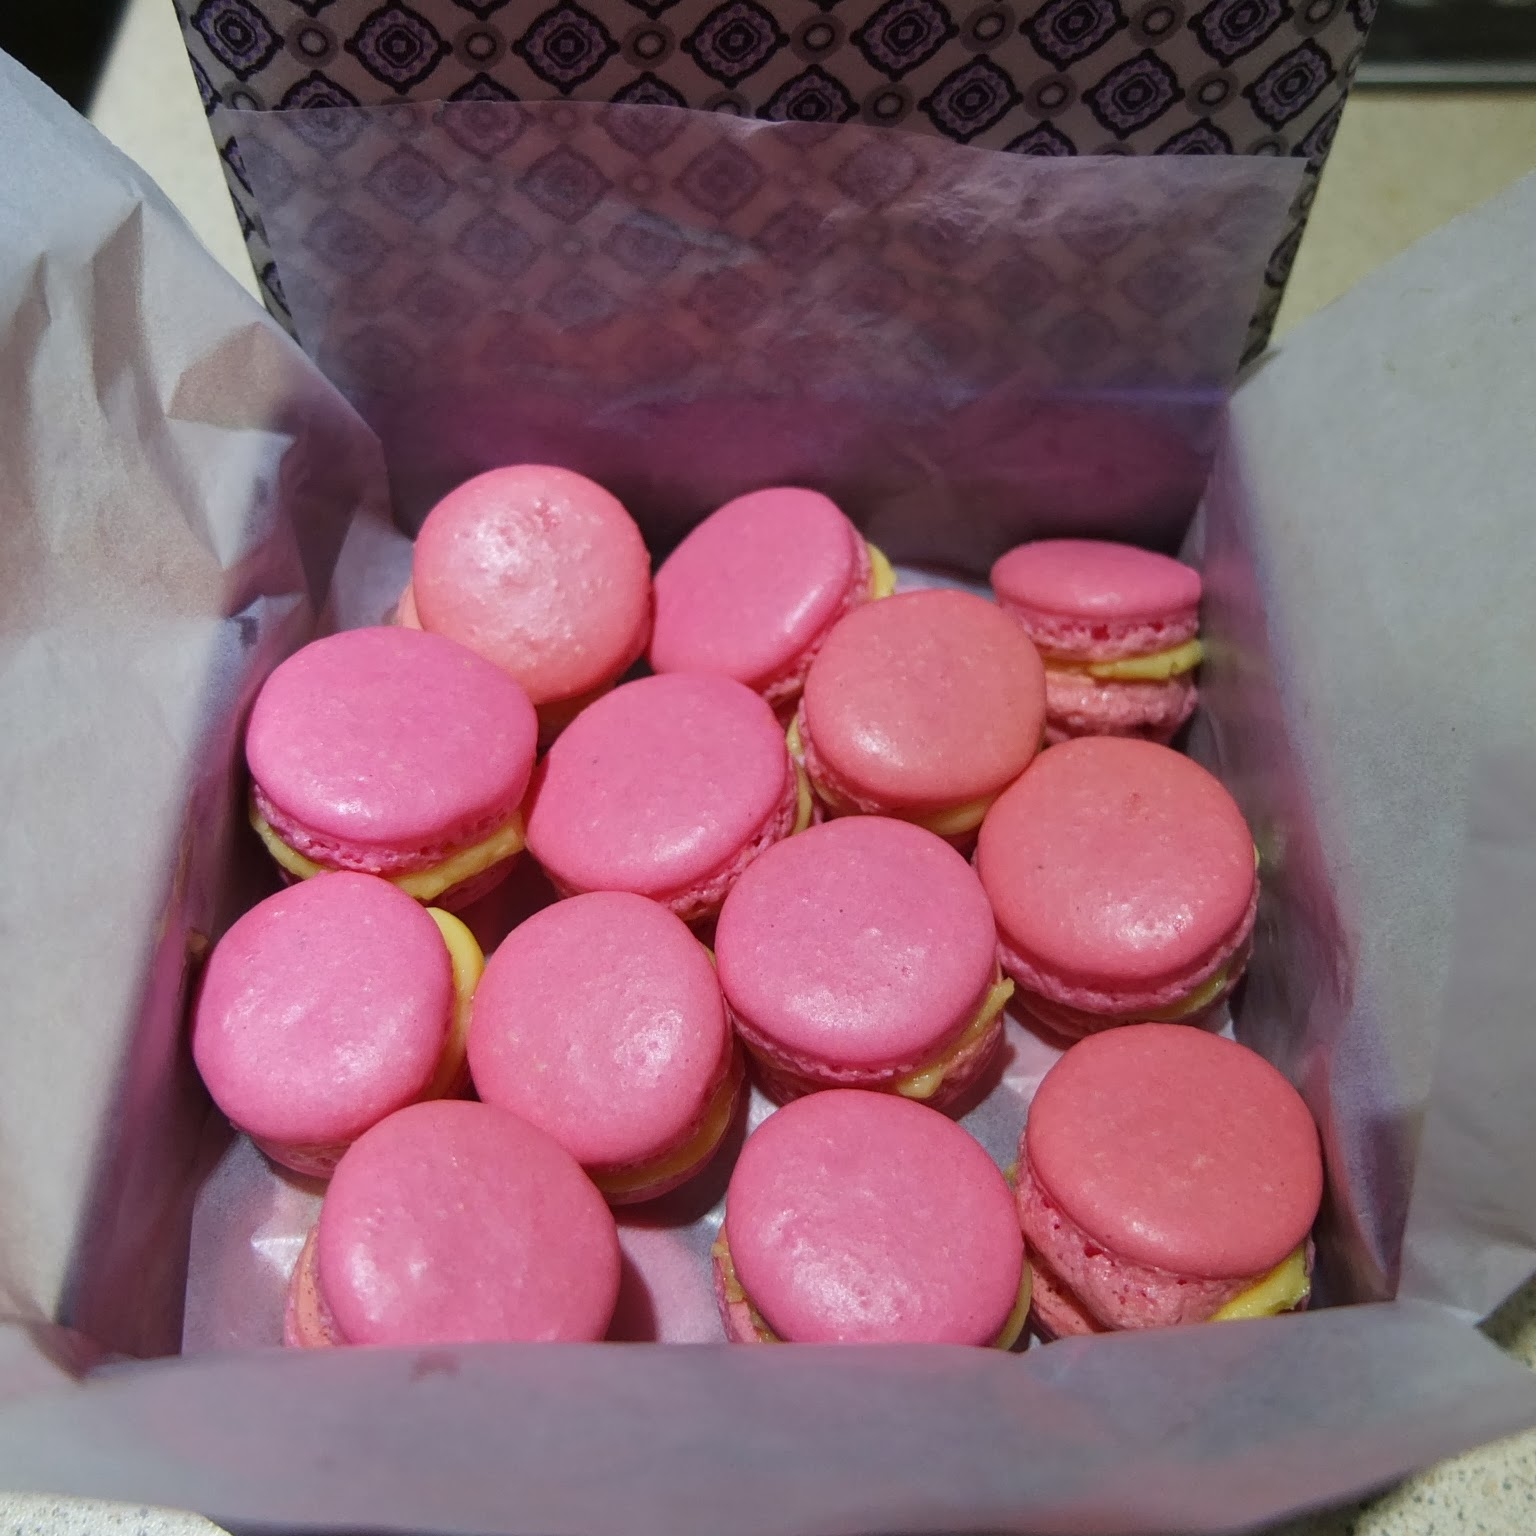 p tisserie nadine rosa macarons mit deutscher buttercreme. Black Bedroom Furniture Sets. Home Design Ideas